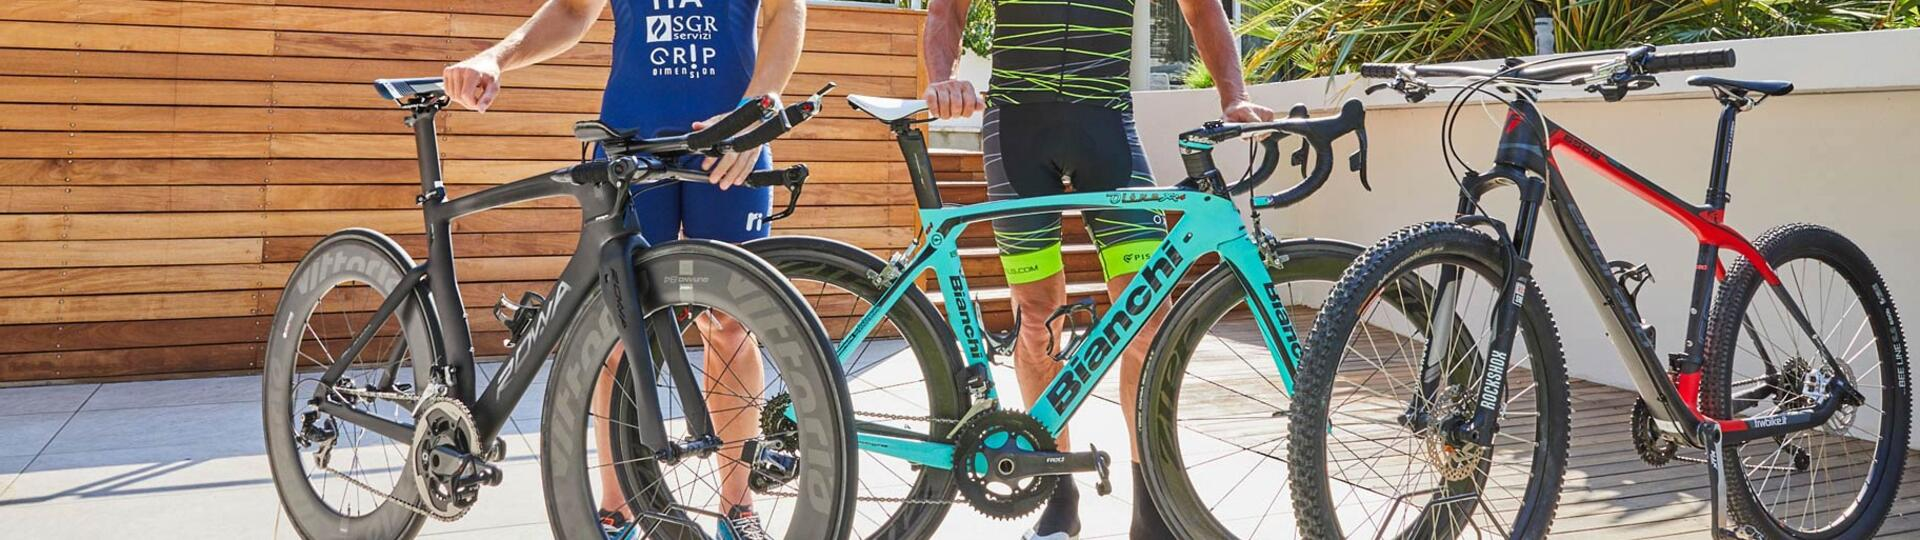 cycling.oxygenhotel it noleggio-bici-rimini 012